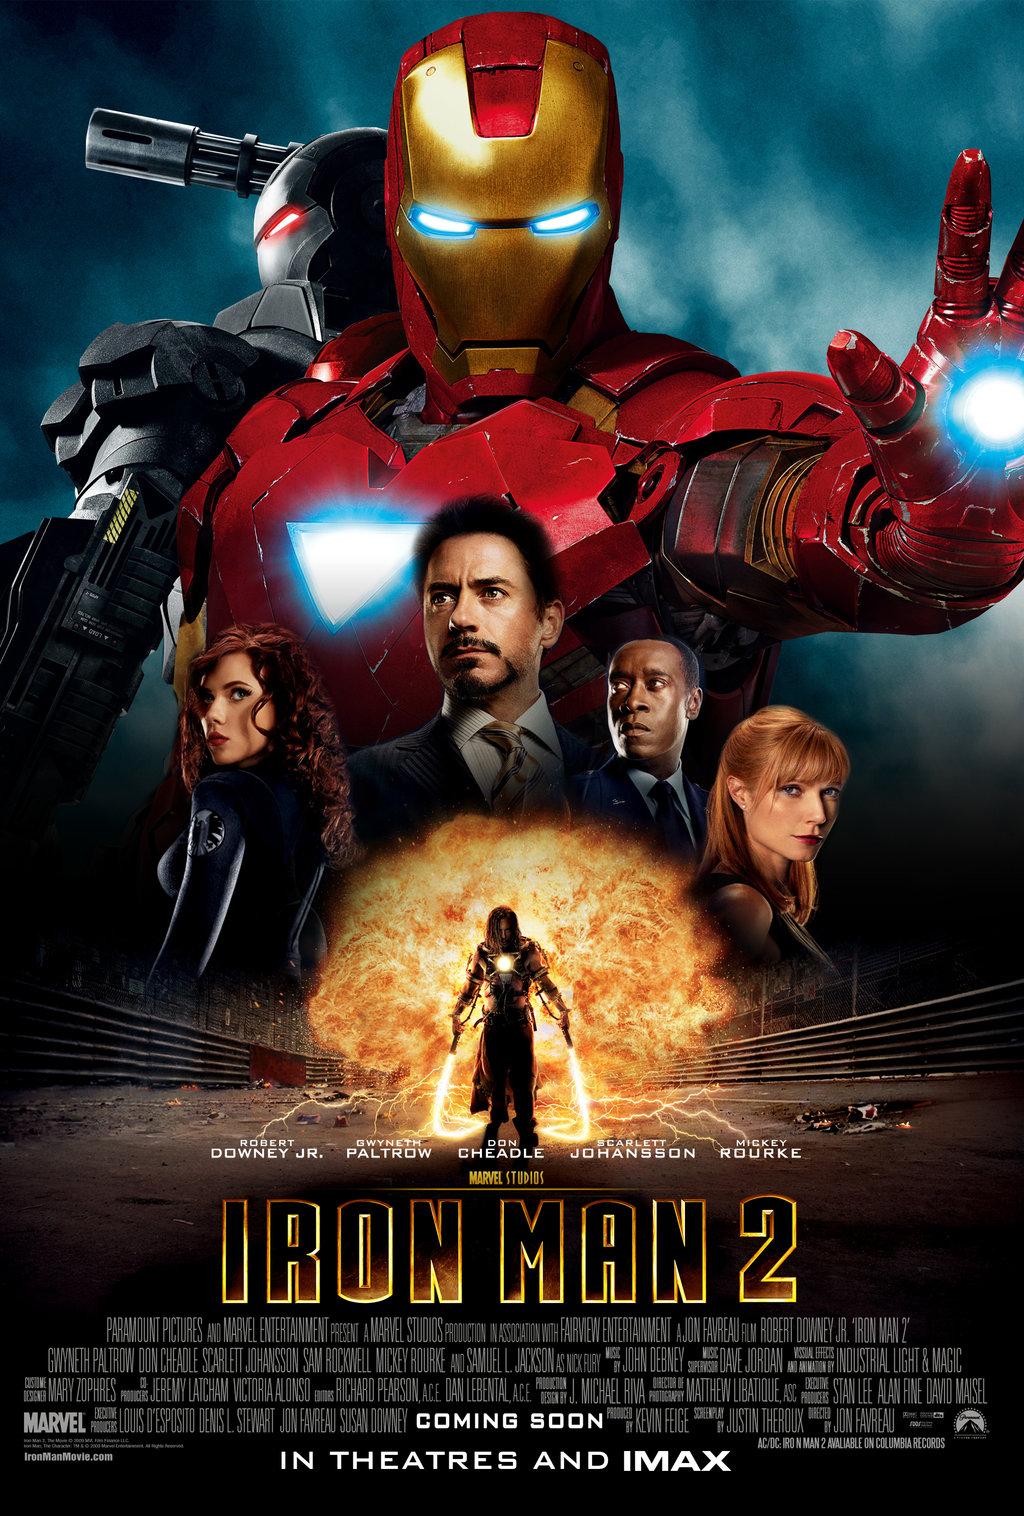 http://1.bp.blogspot.com/-dq5JqJnToAg/T5WyrxZ0ZtI/AAAAAAAAARc/n0o_3jnJEUc/s1600/Iron_Man_2_Poster_7_by_ScorpionSoldier.jpg